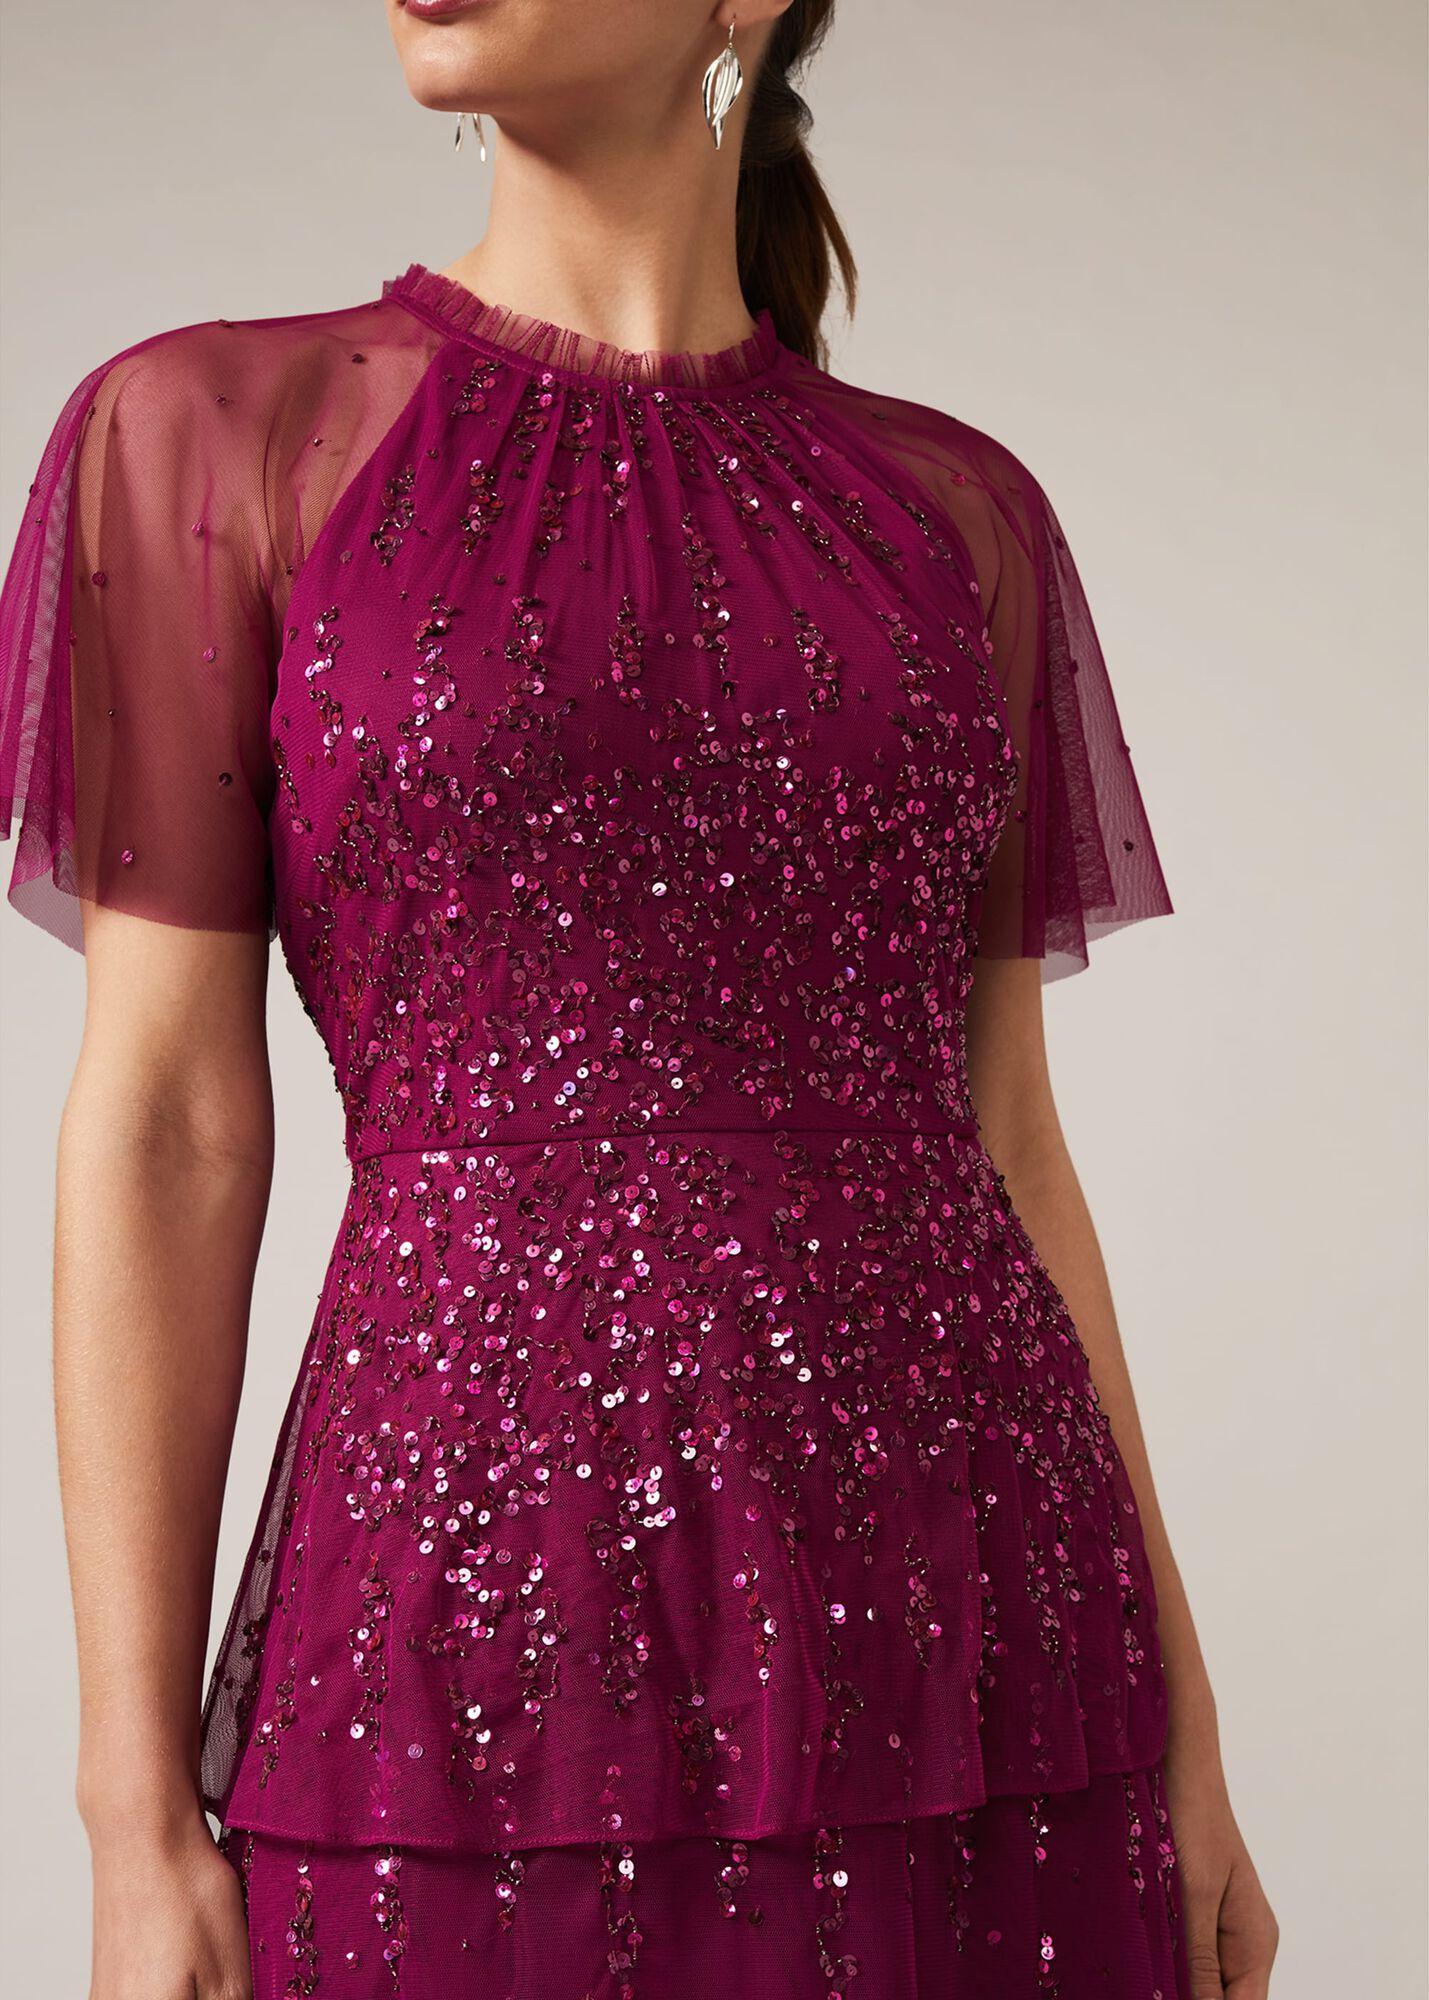 209427720-05-liliana-tiered-embellished-dress.jpg?sw=1429&sh=2000&strip=false